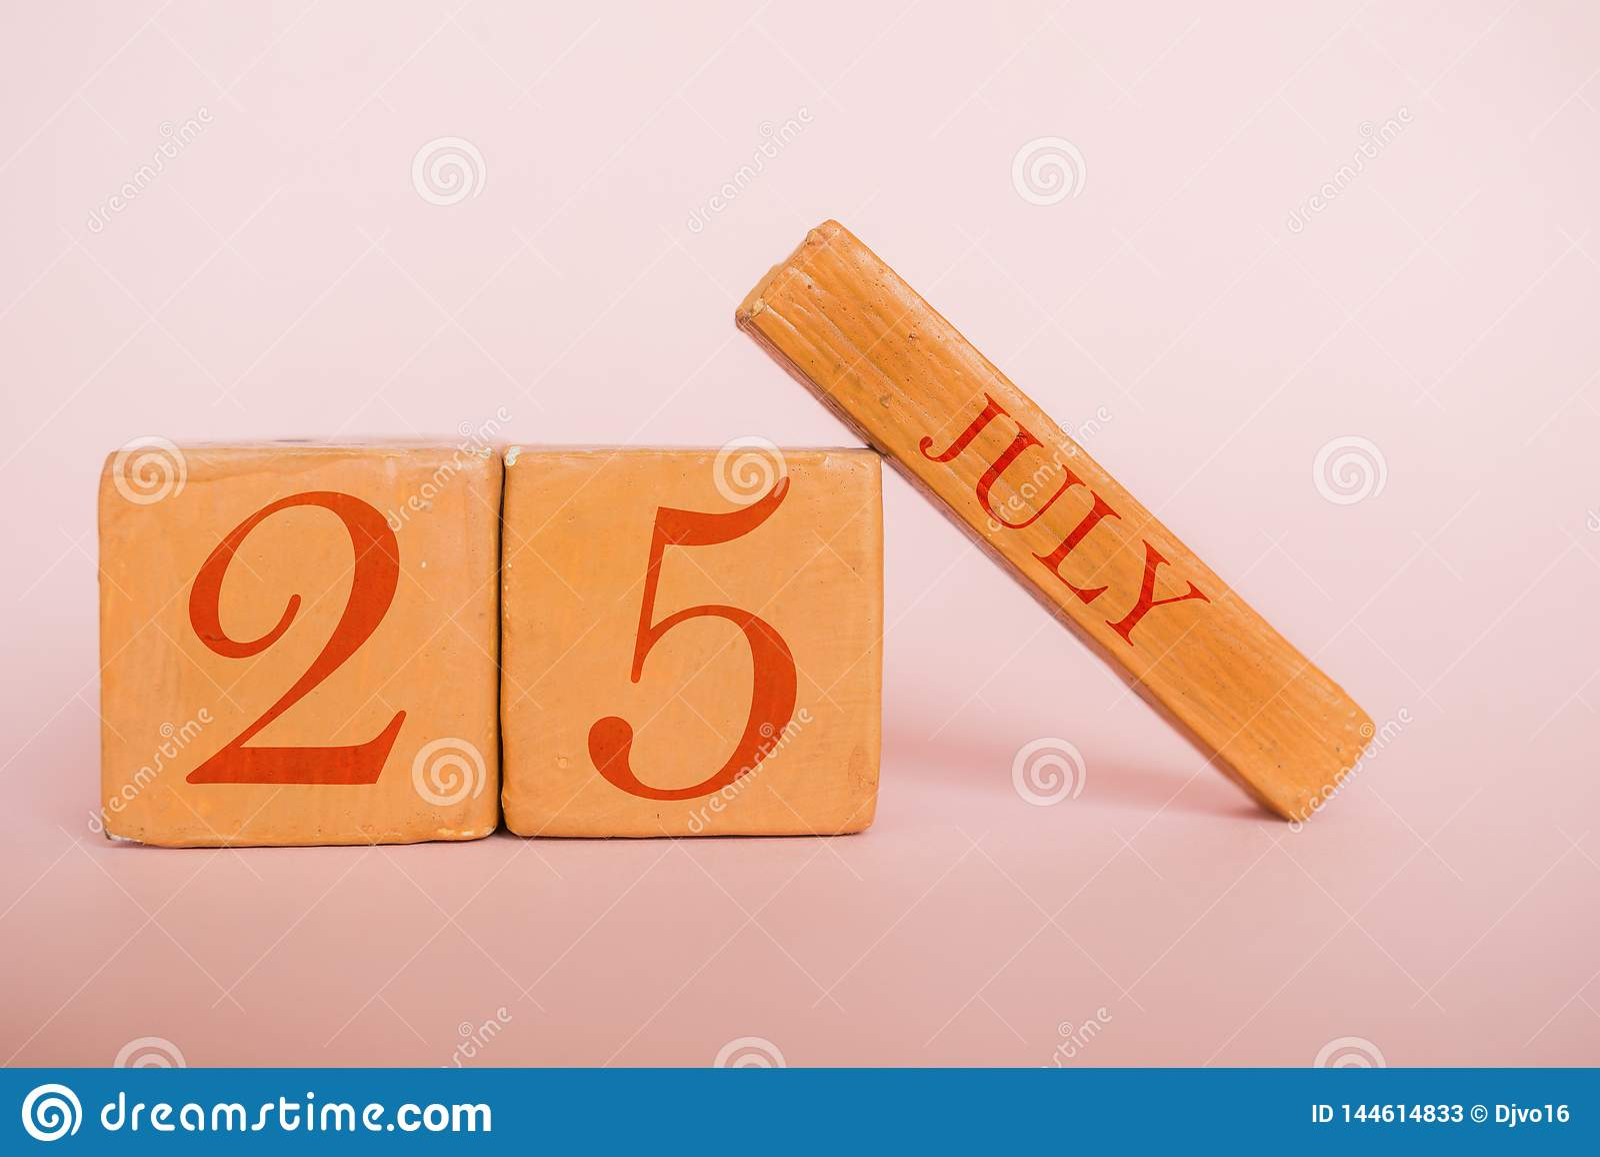 July 25th Day 25 Of Month Handmade Wood Calendar On Modern